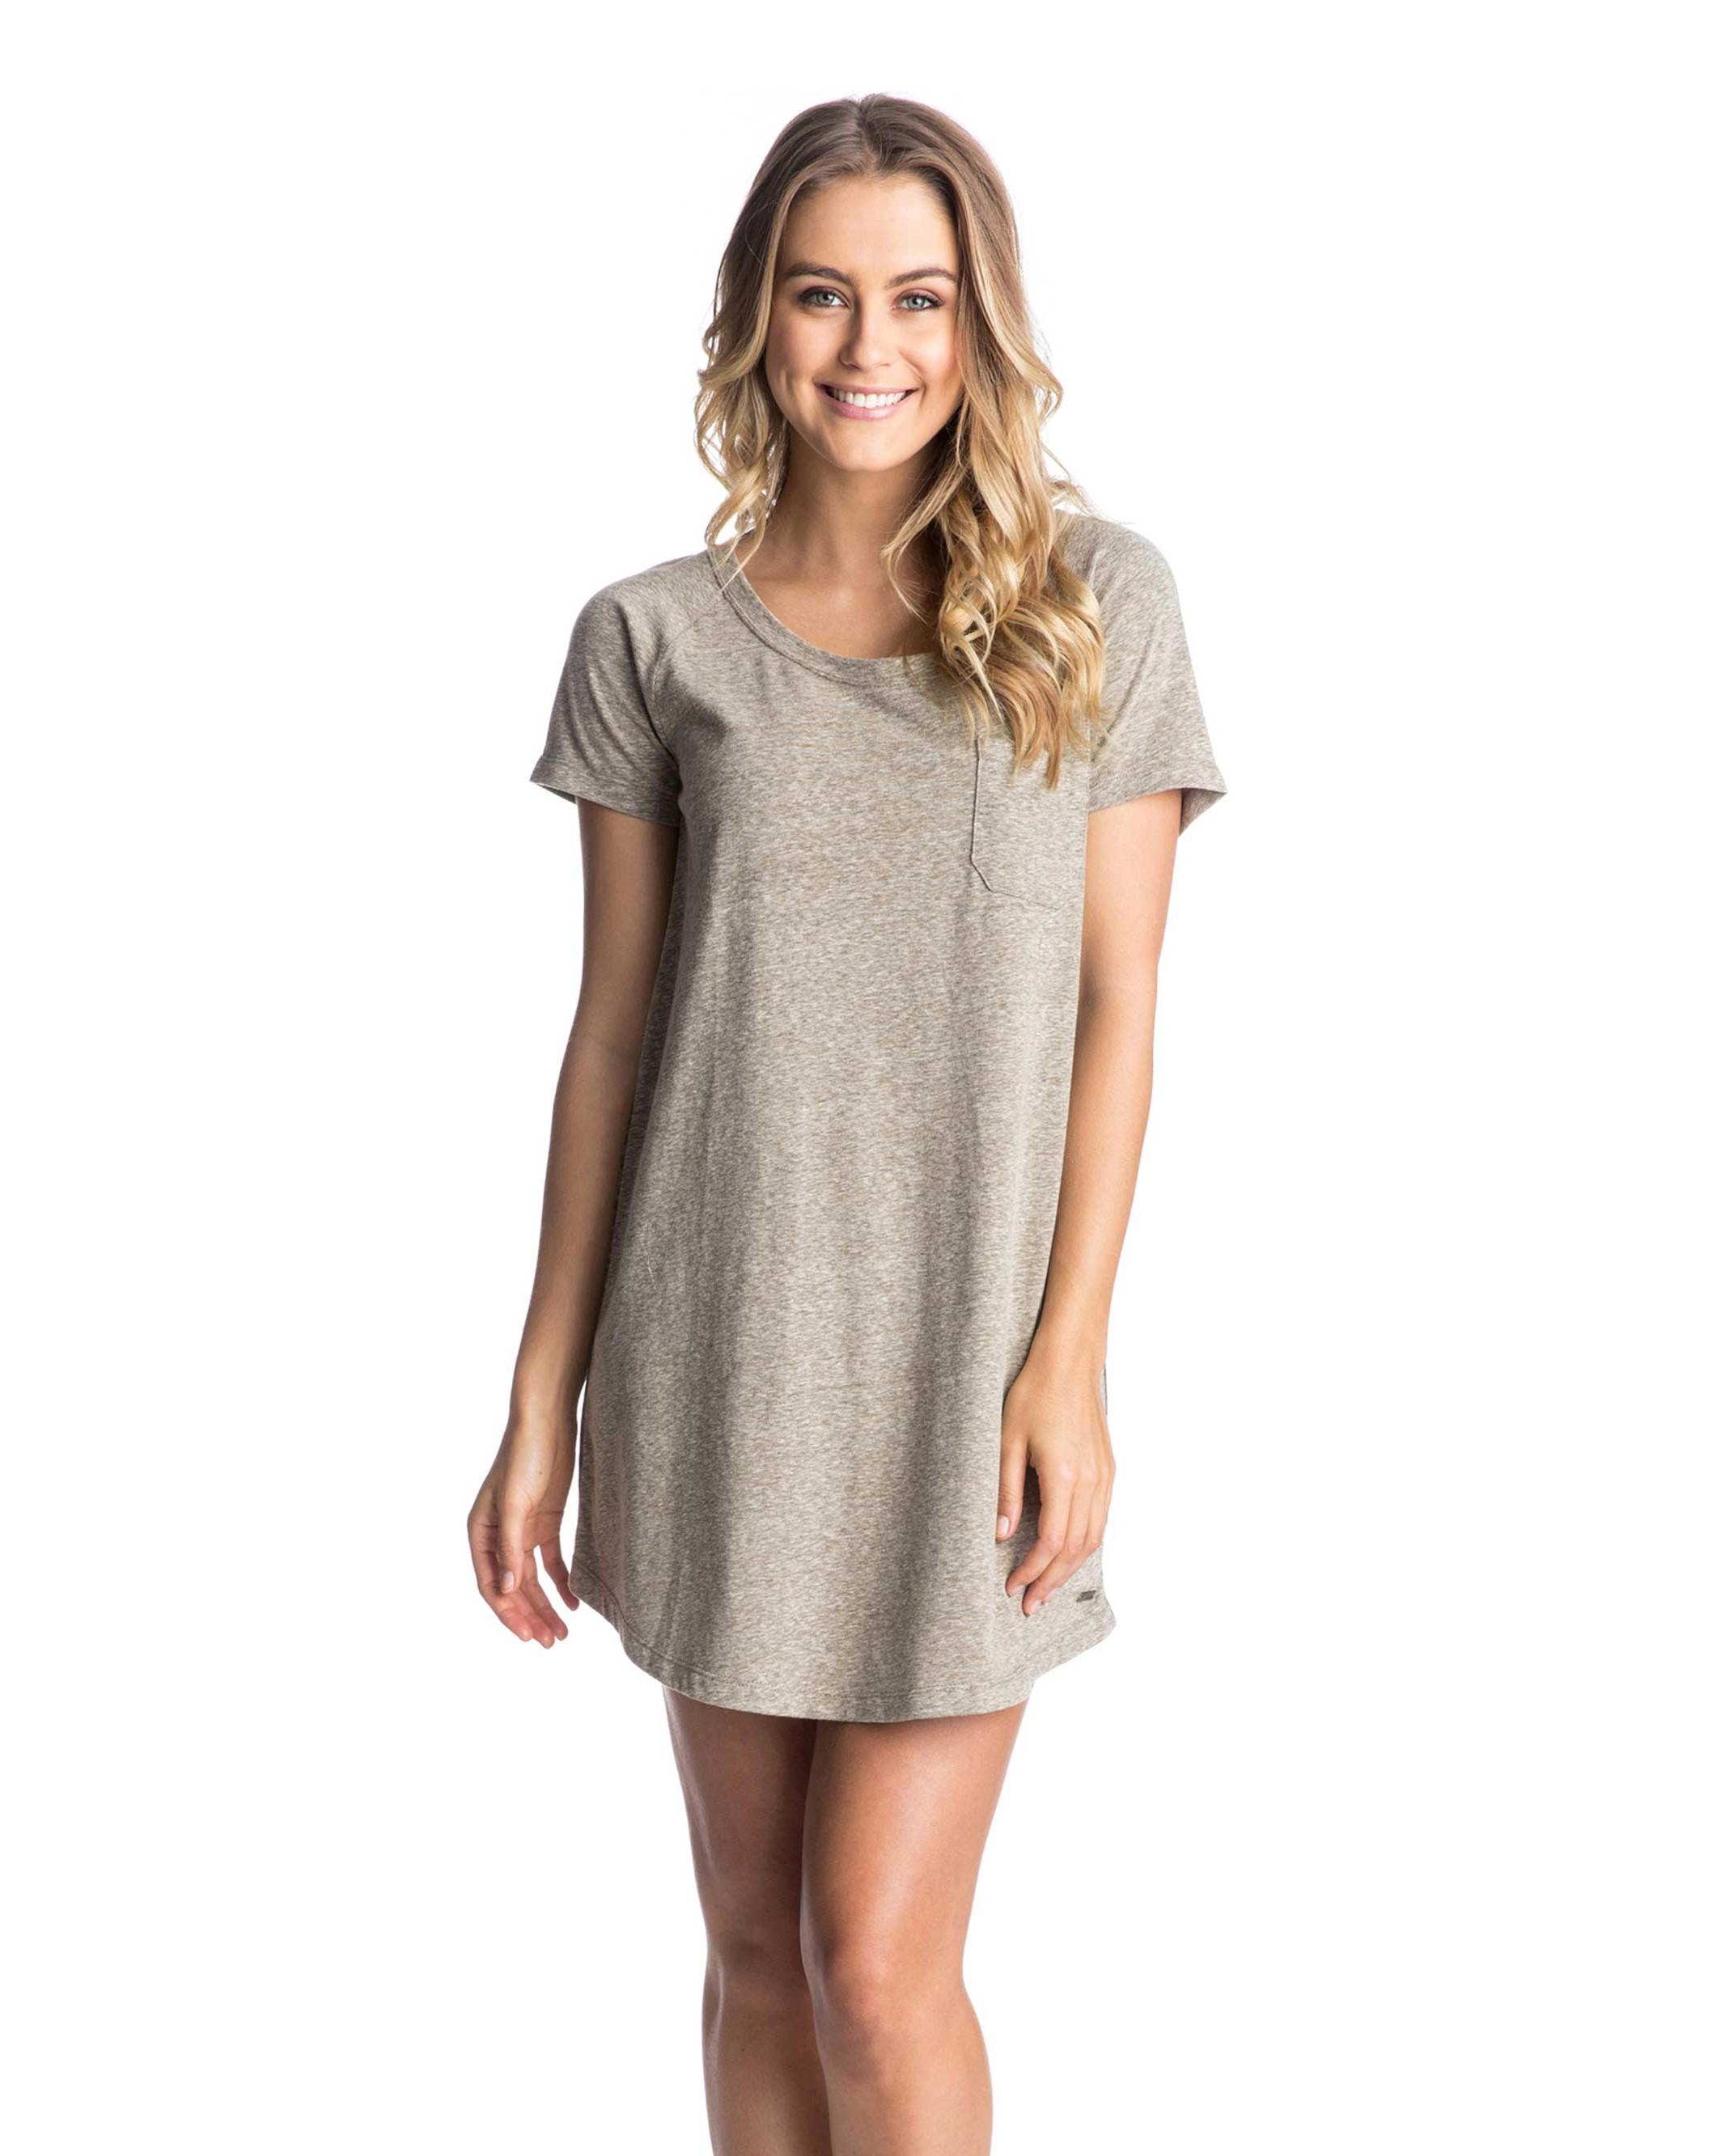 007da3e7cb1 dámské šaty roxy BEN WESTON J KTDR CQW0